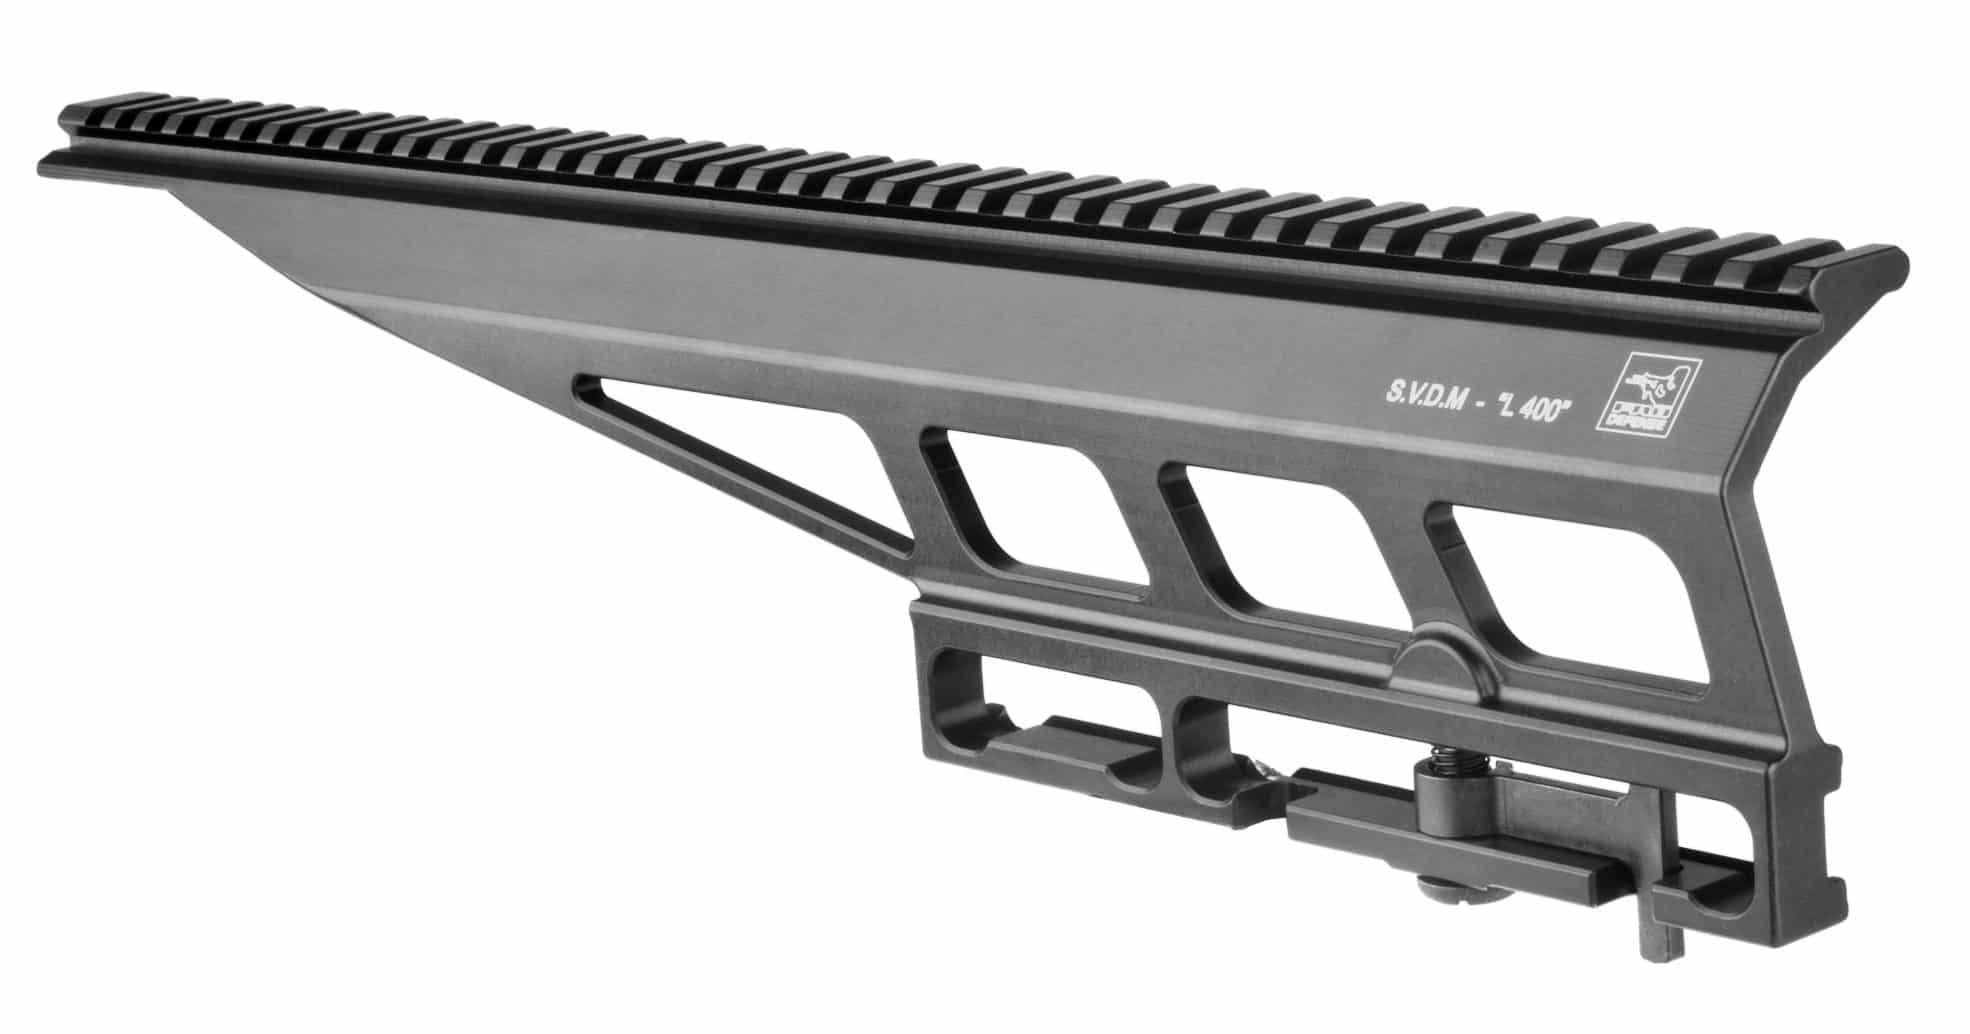 SVDM L-400 Fab Defense Dragunov Sniper Rifle Scope Mount